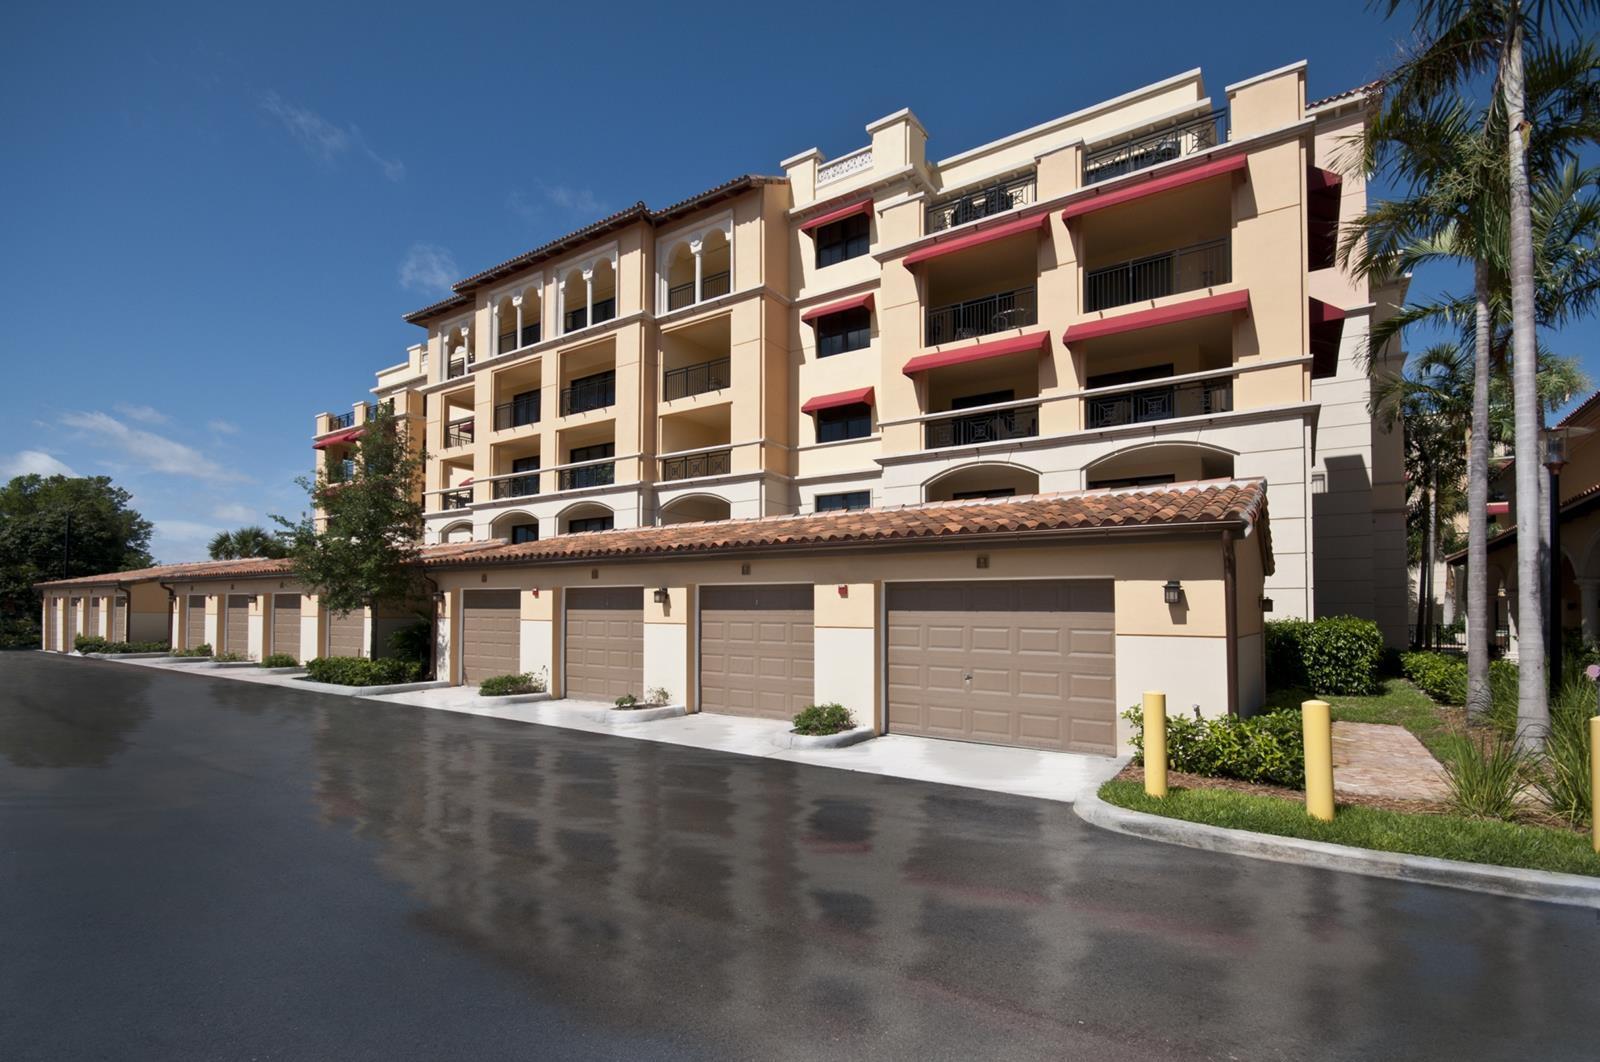 137 Apartments for Rent in Boca Raton, FL   ApartmentRatings©